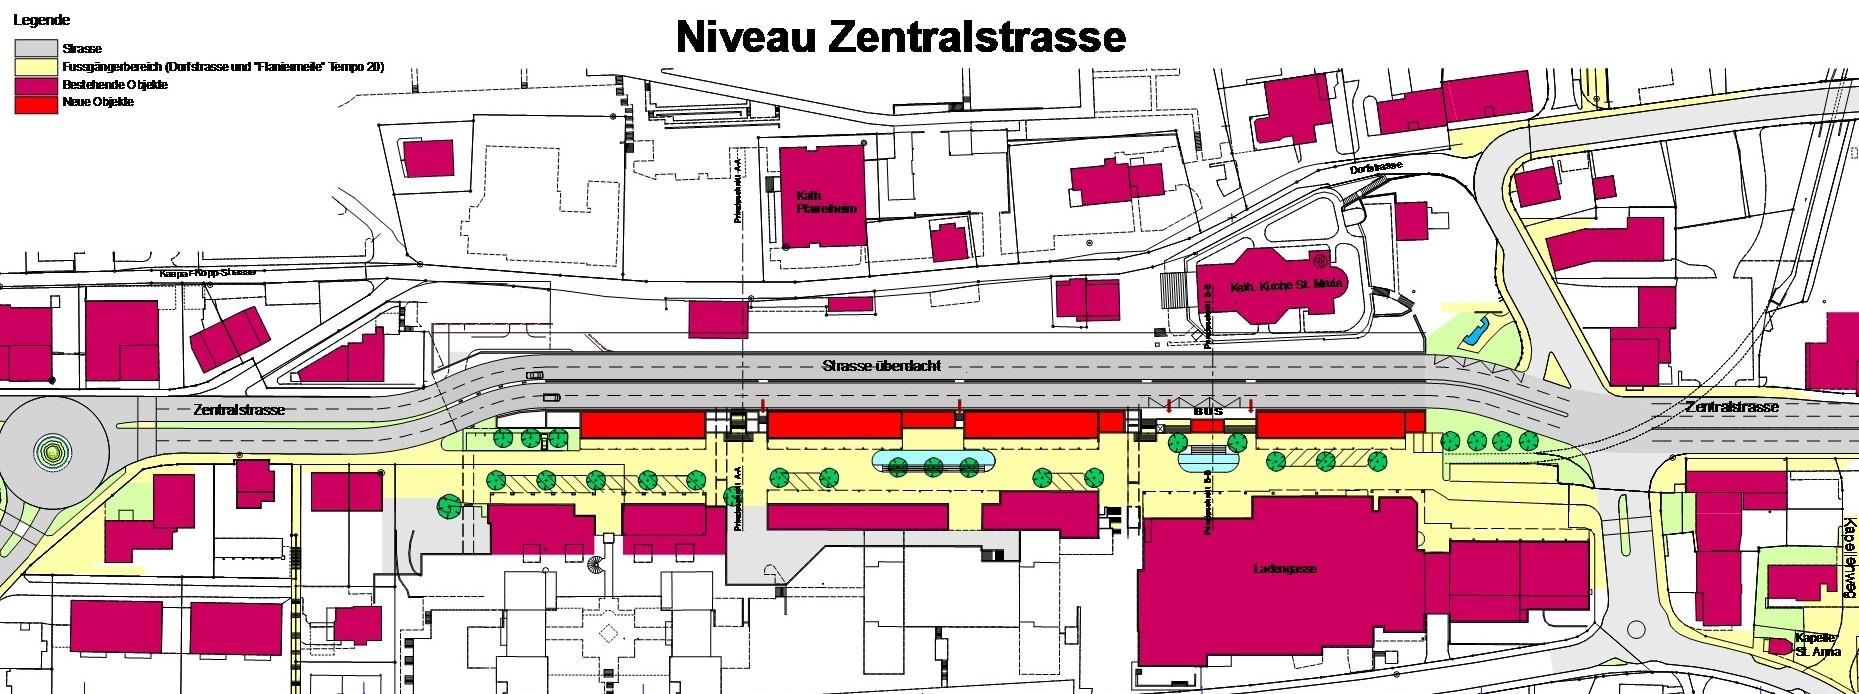 Ebikon Niveau Zentralstrasse